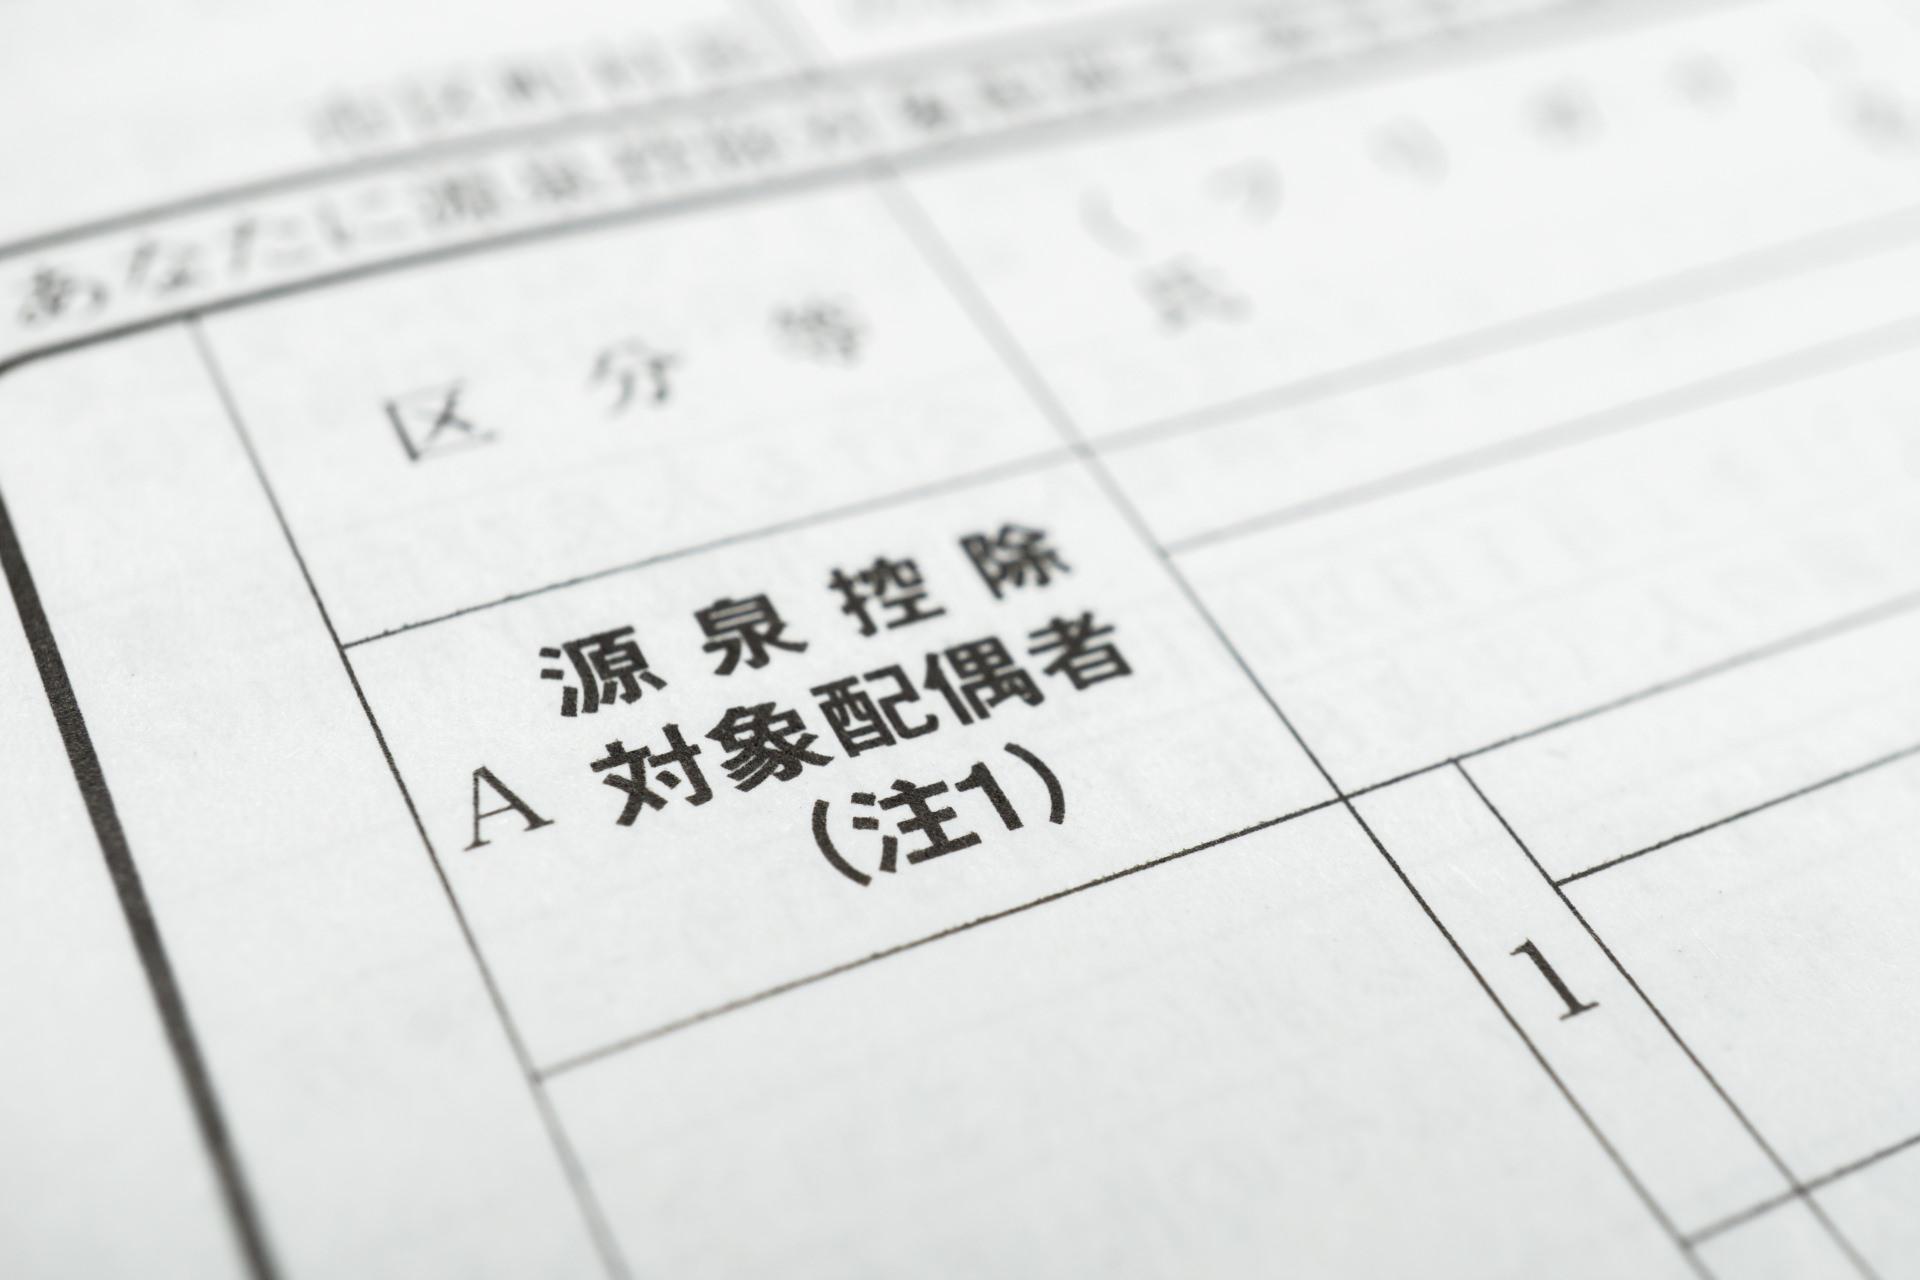 贈与税の配偶者控除